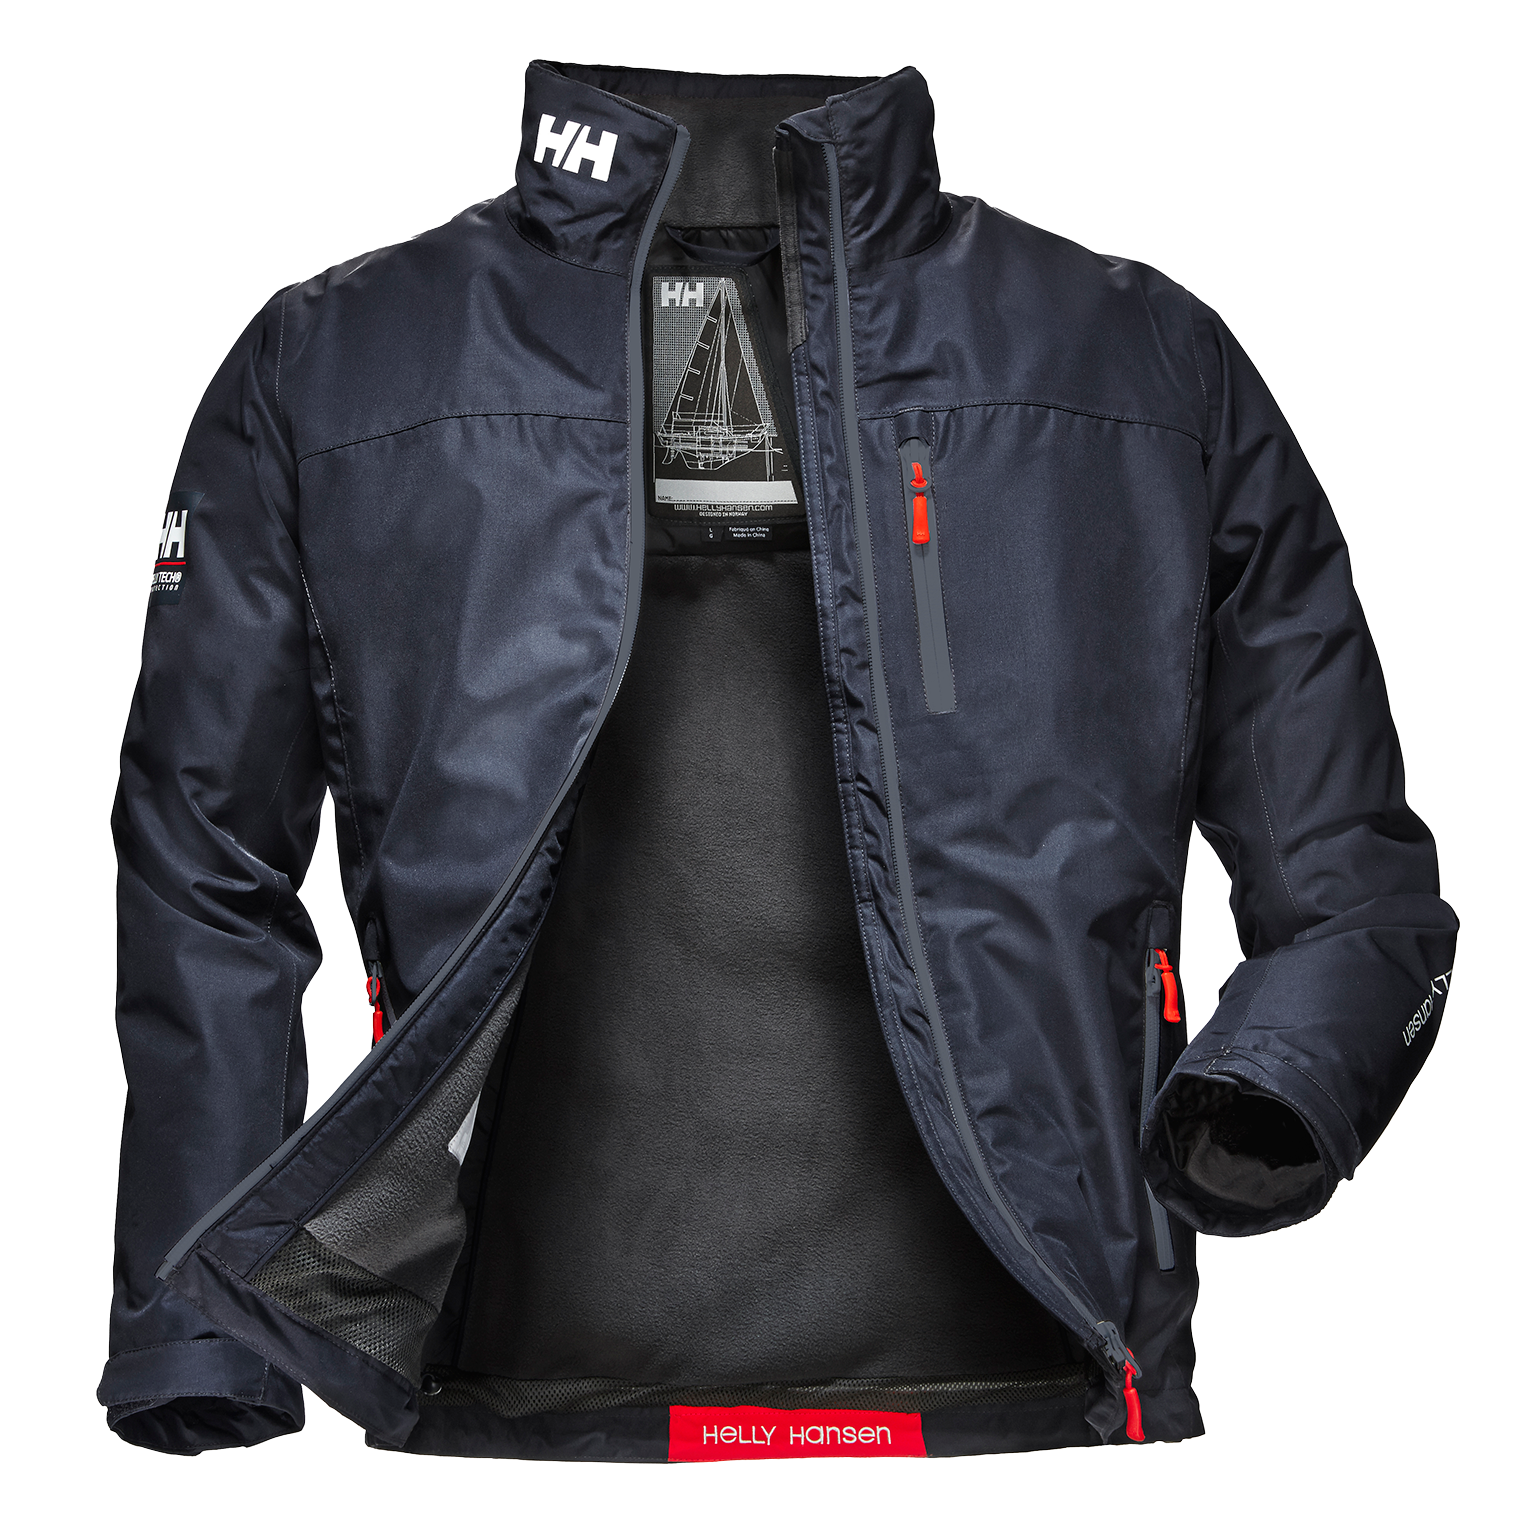 11e0ed9d78f4 Helly Hansen Men s Crew Midlayer Jacket   BUY ASAP MUST MUST ...